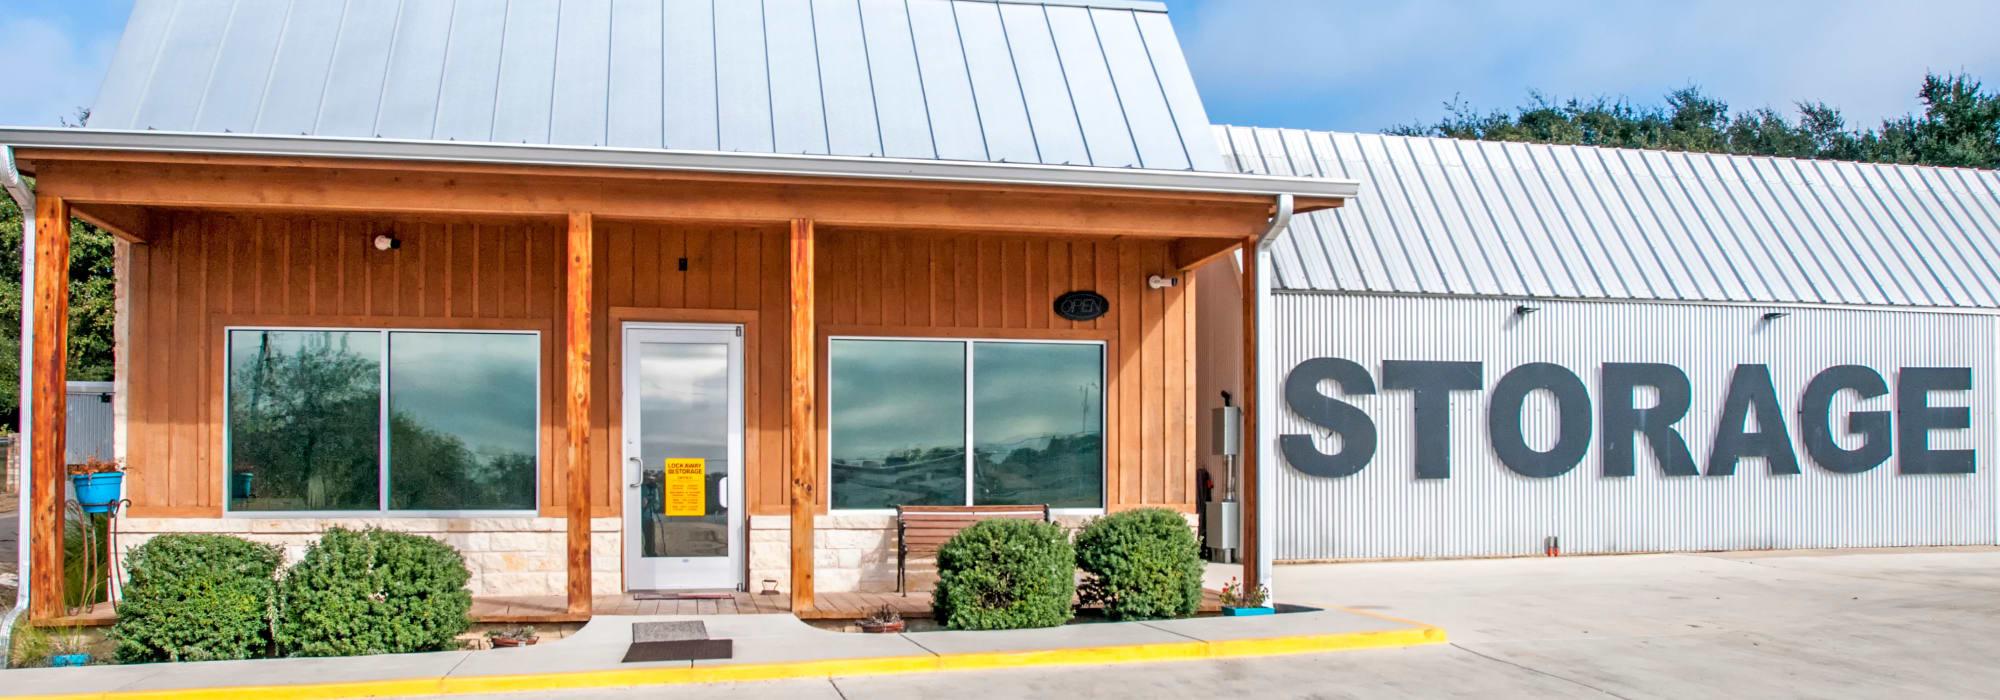 Front Office Exterior Lockaway Storage in Boerne, Texas